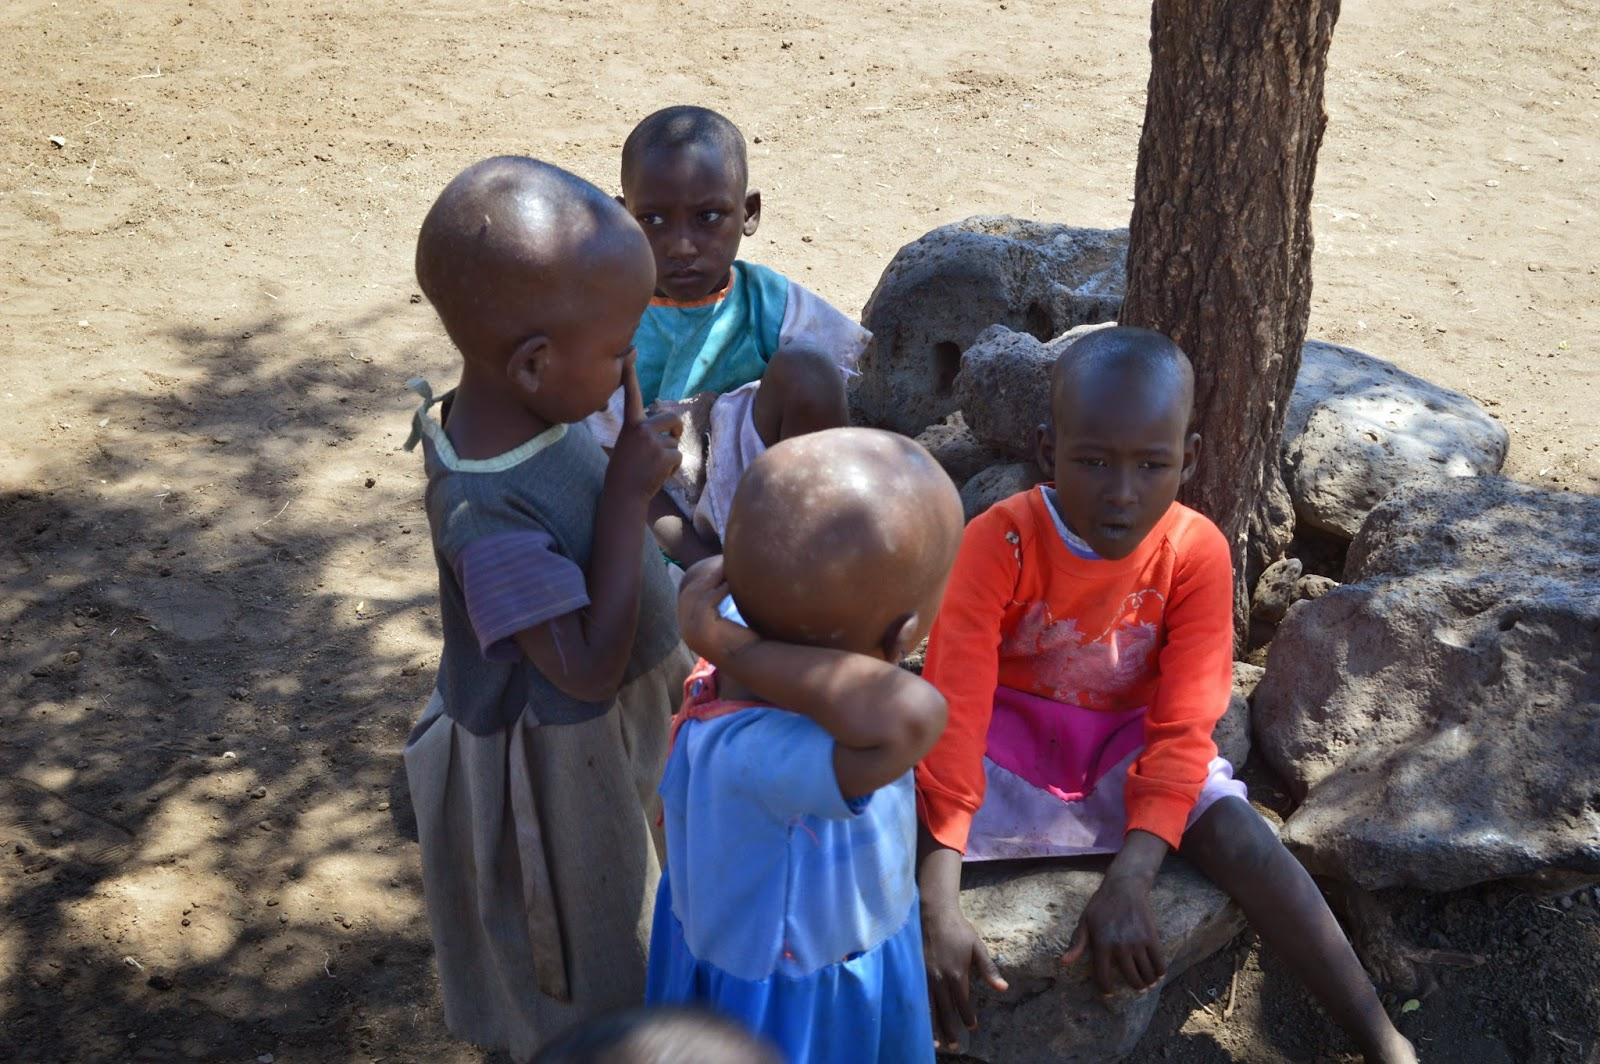 Trabajo infantil en Tanzania